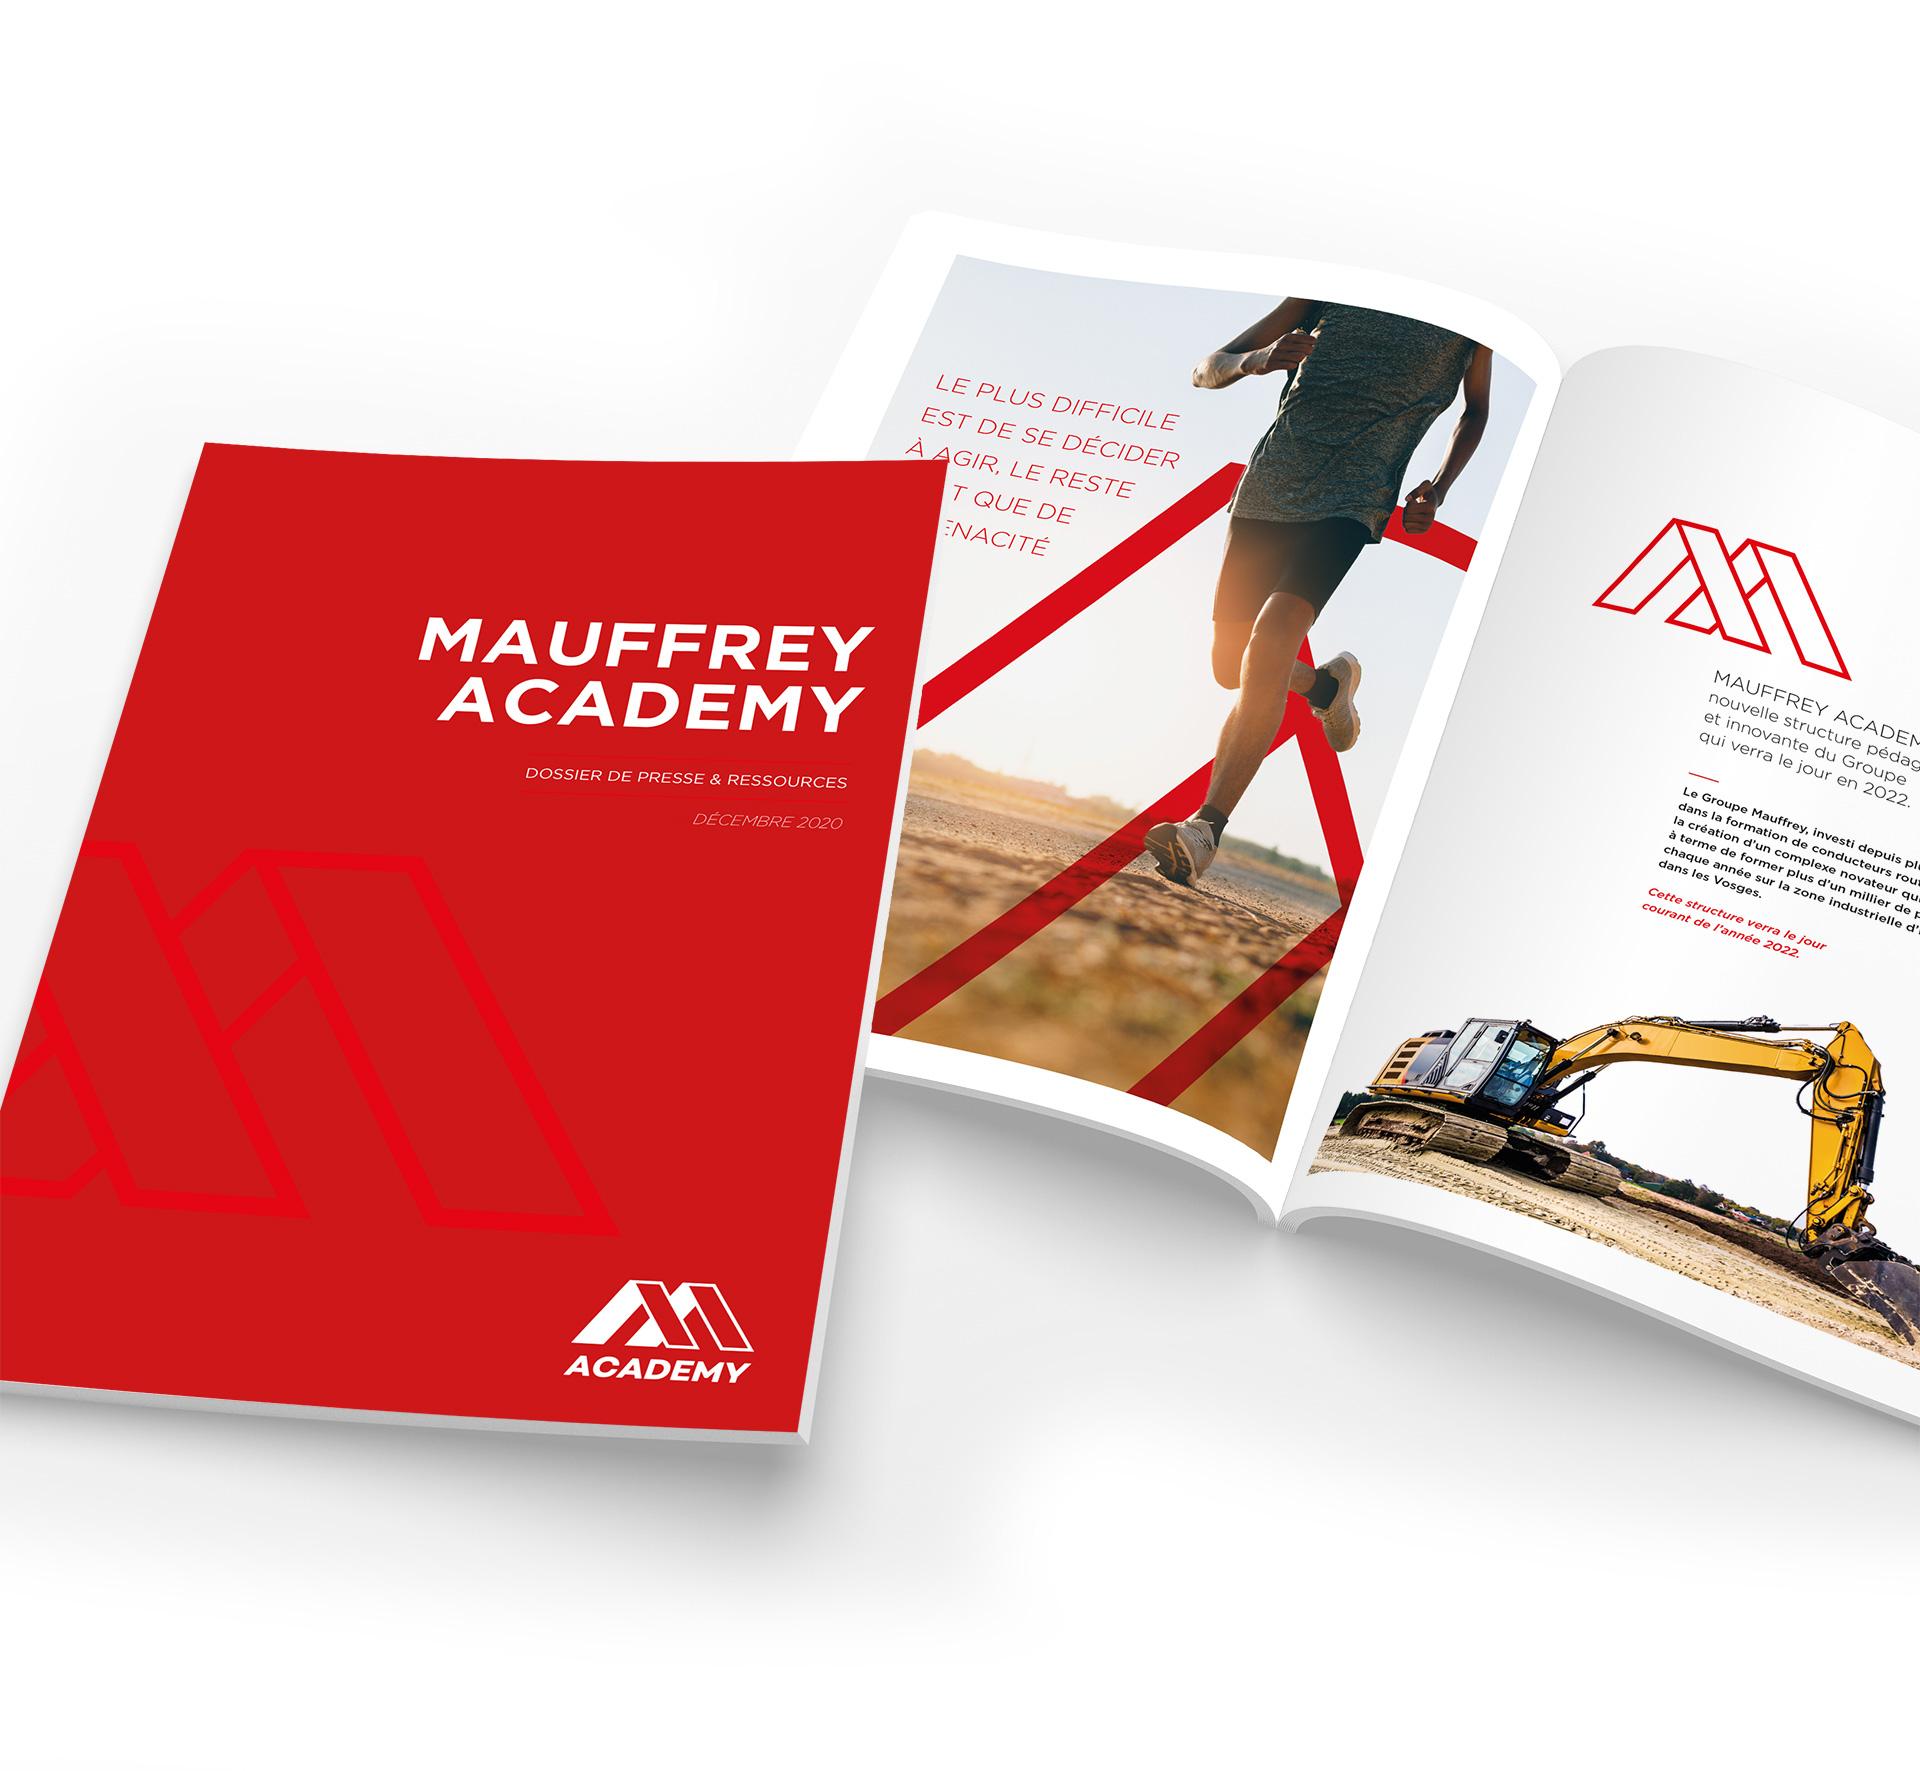 Academy-Mauffrey-presse-Dossier-de-presse